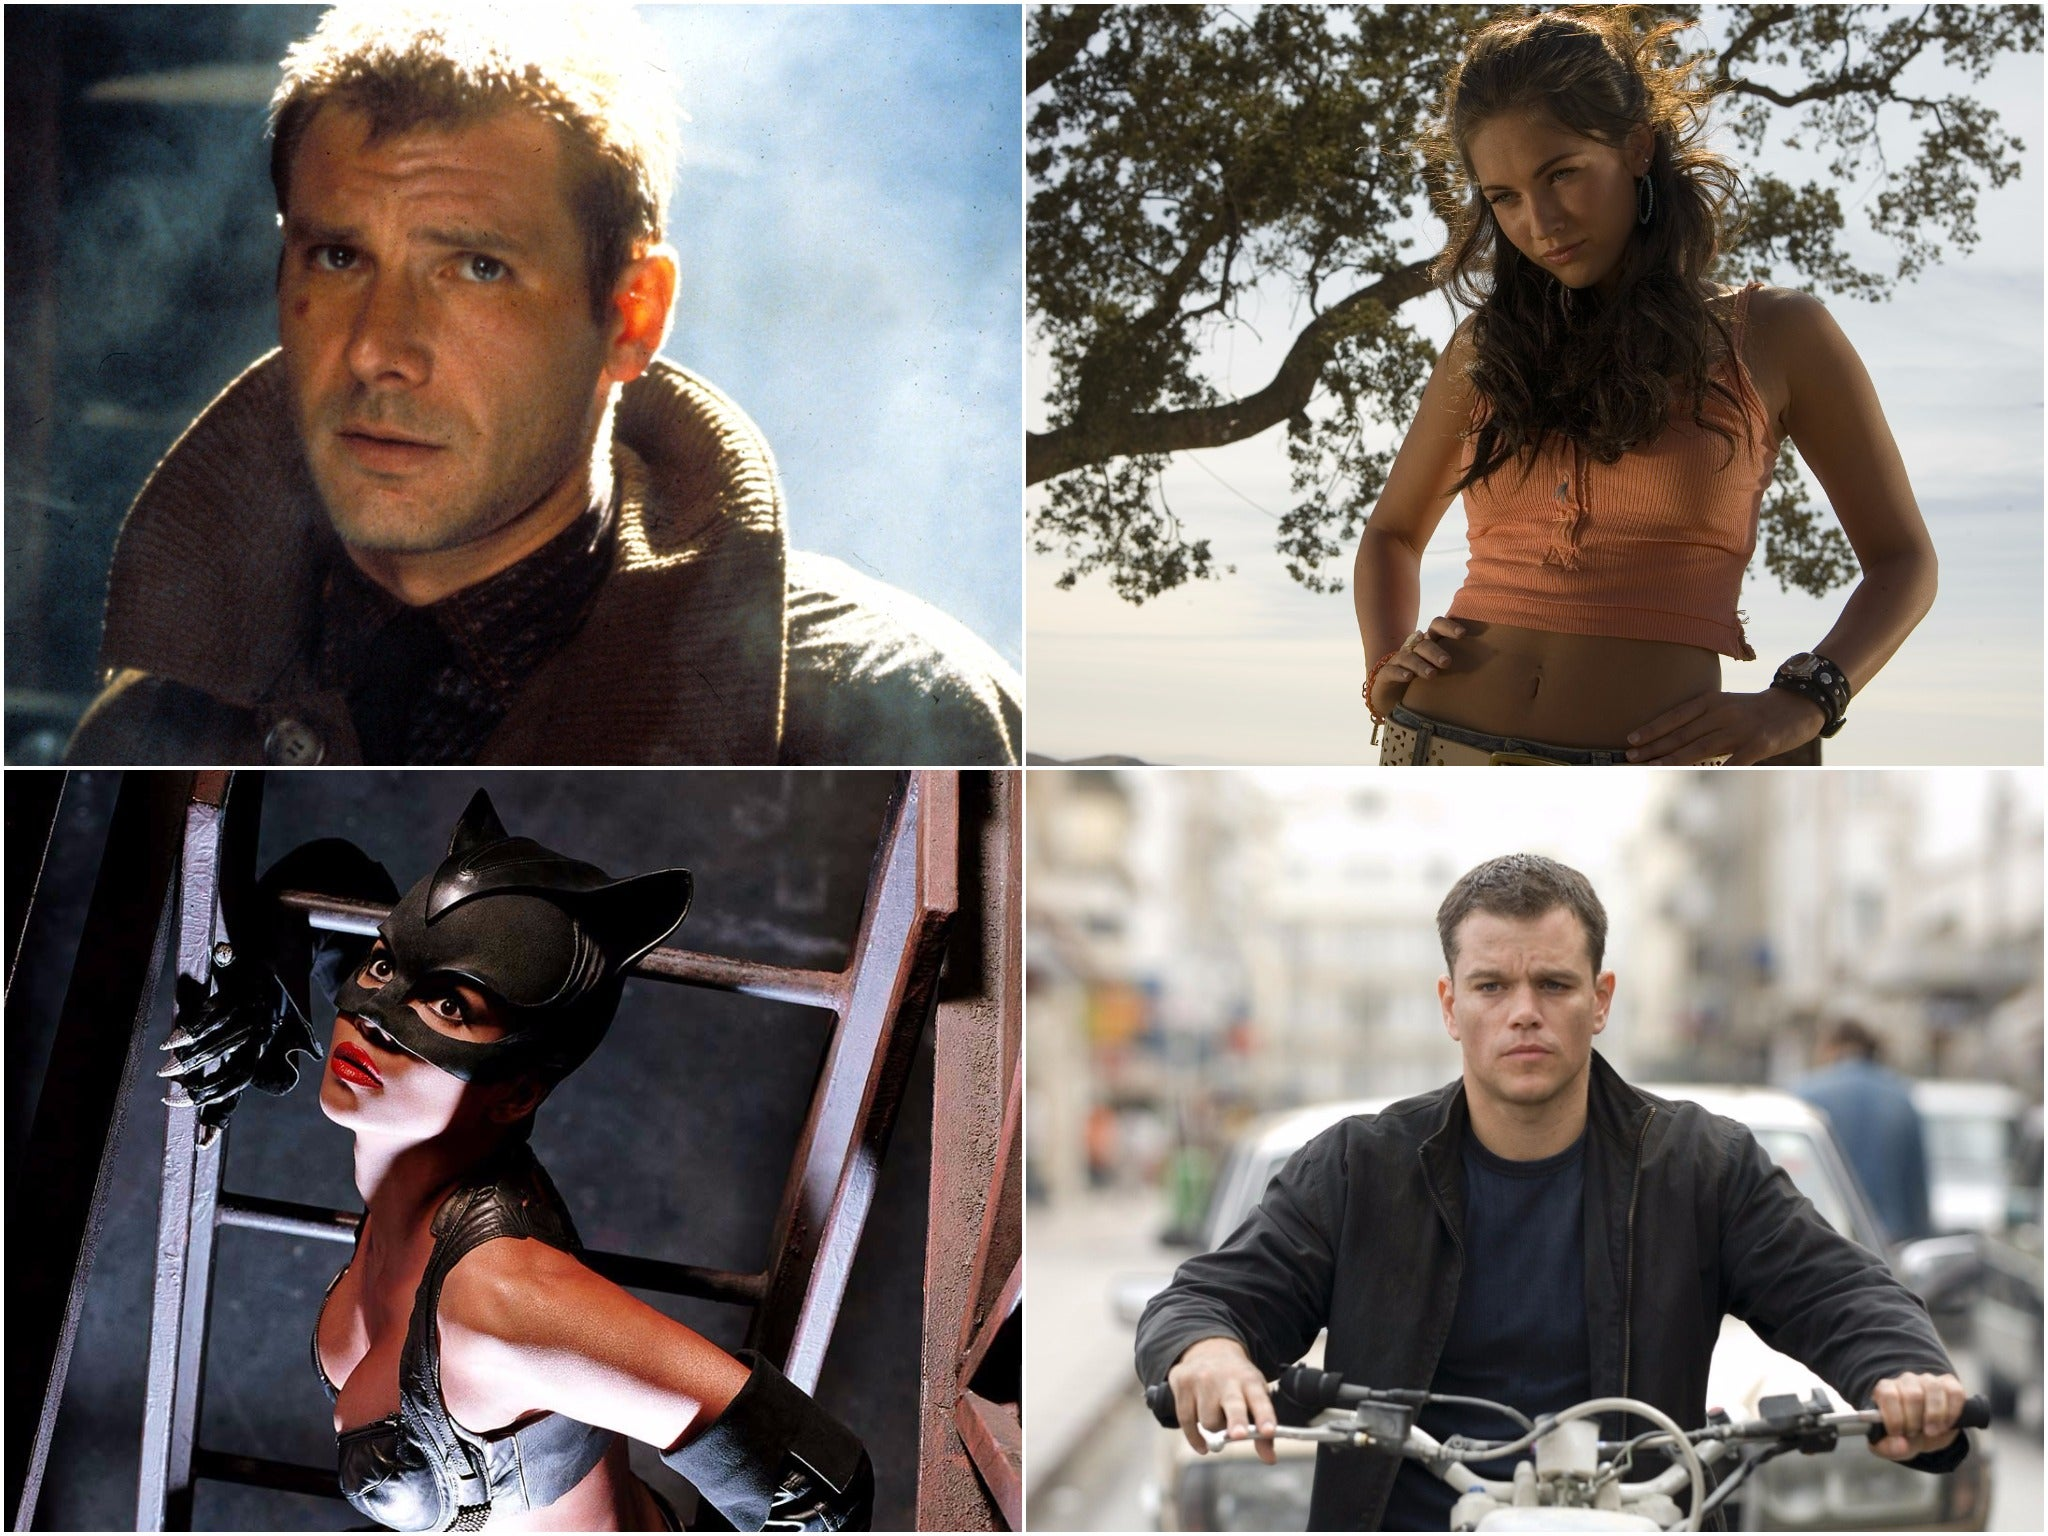 34 actors who regret big roles, from Ben Affleck and Viola Davis to Jessica Alba and Daniel Radcliffe